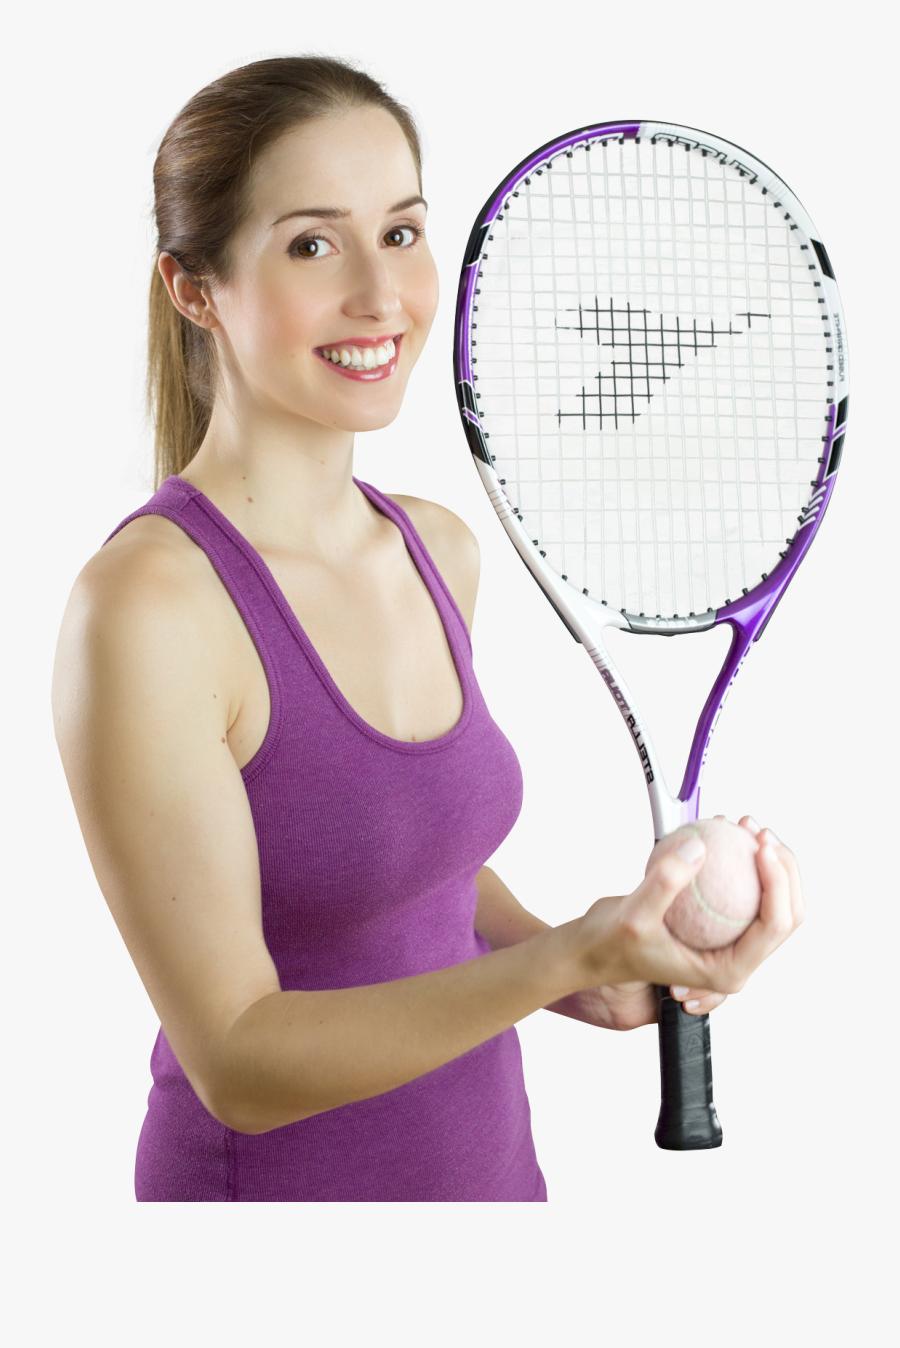 Tennis Sport Player Png, Transparent Clipart